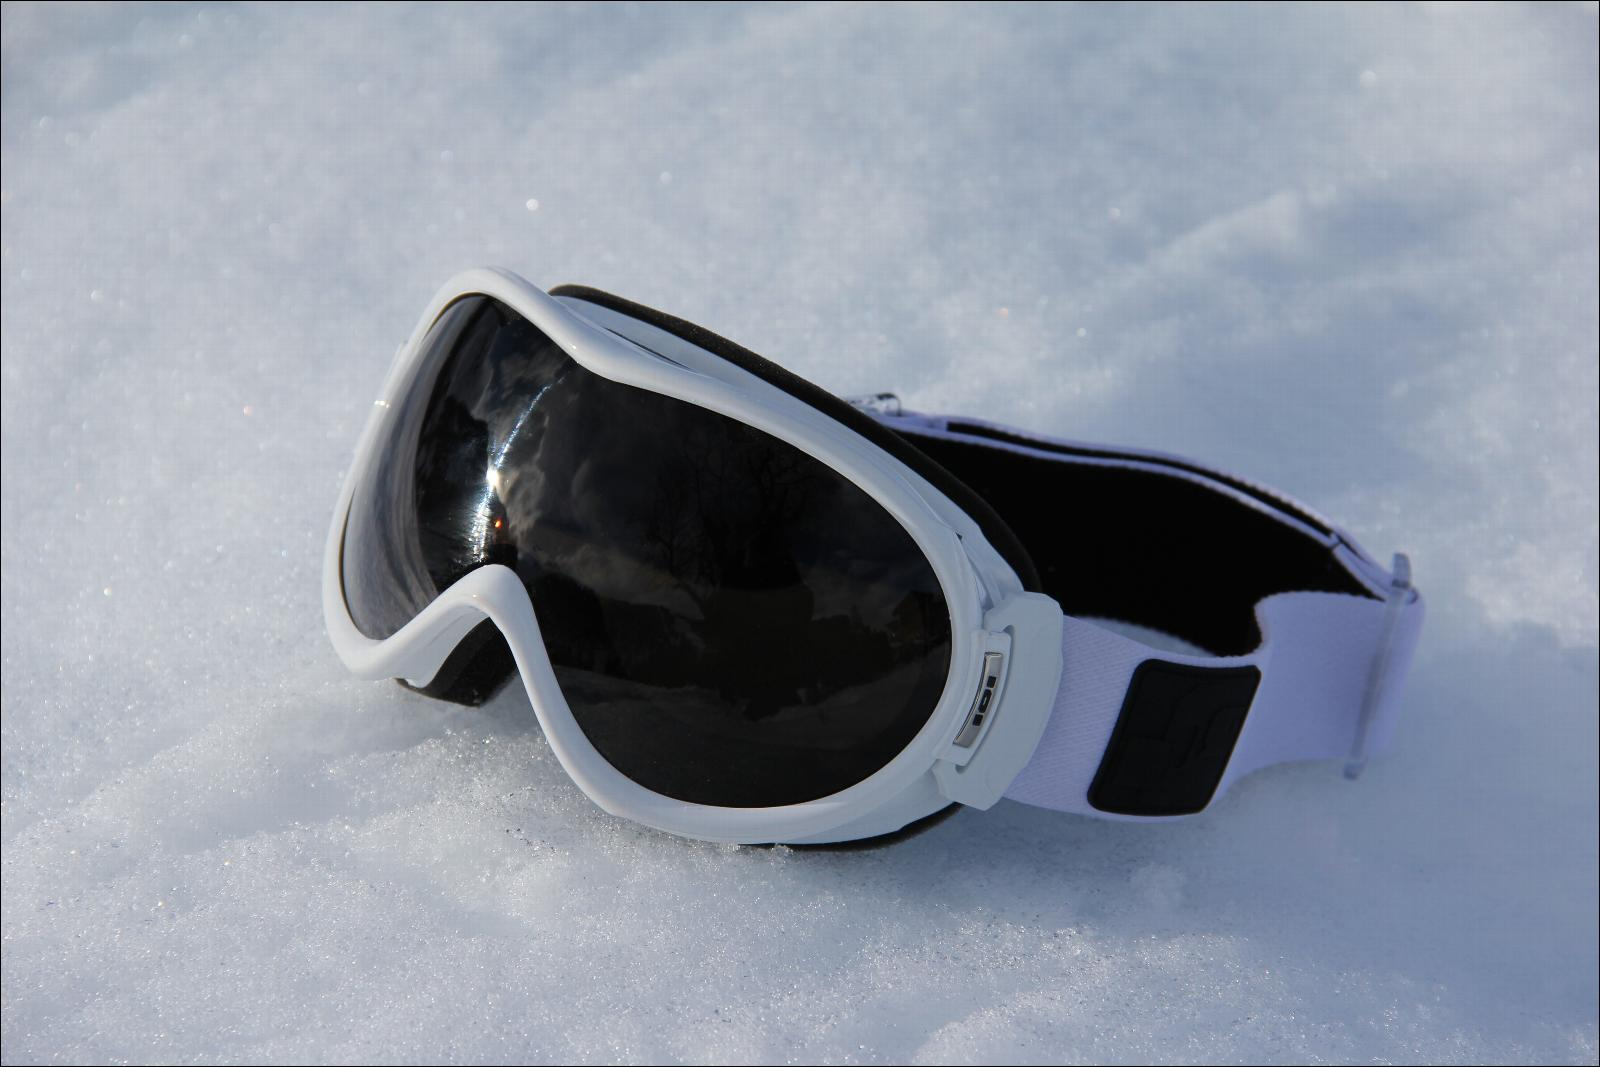 Masque de ski Demetz Panora - Ecran polarisé photochromique a066358c8d4a